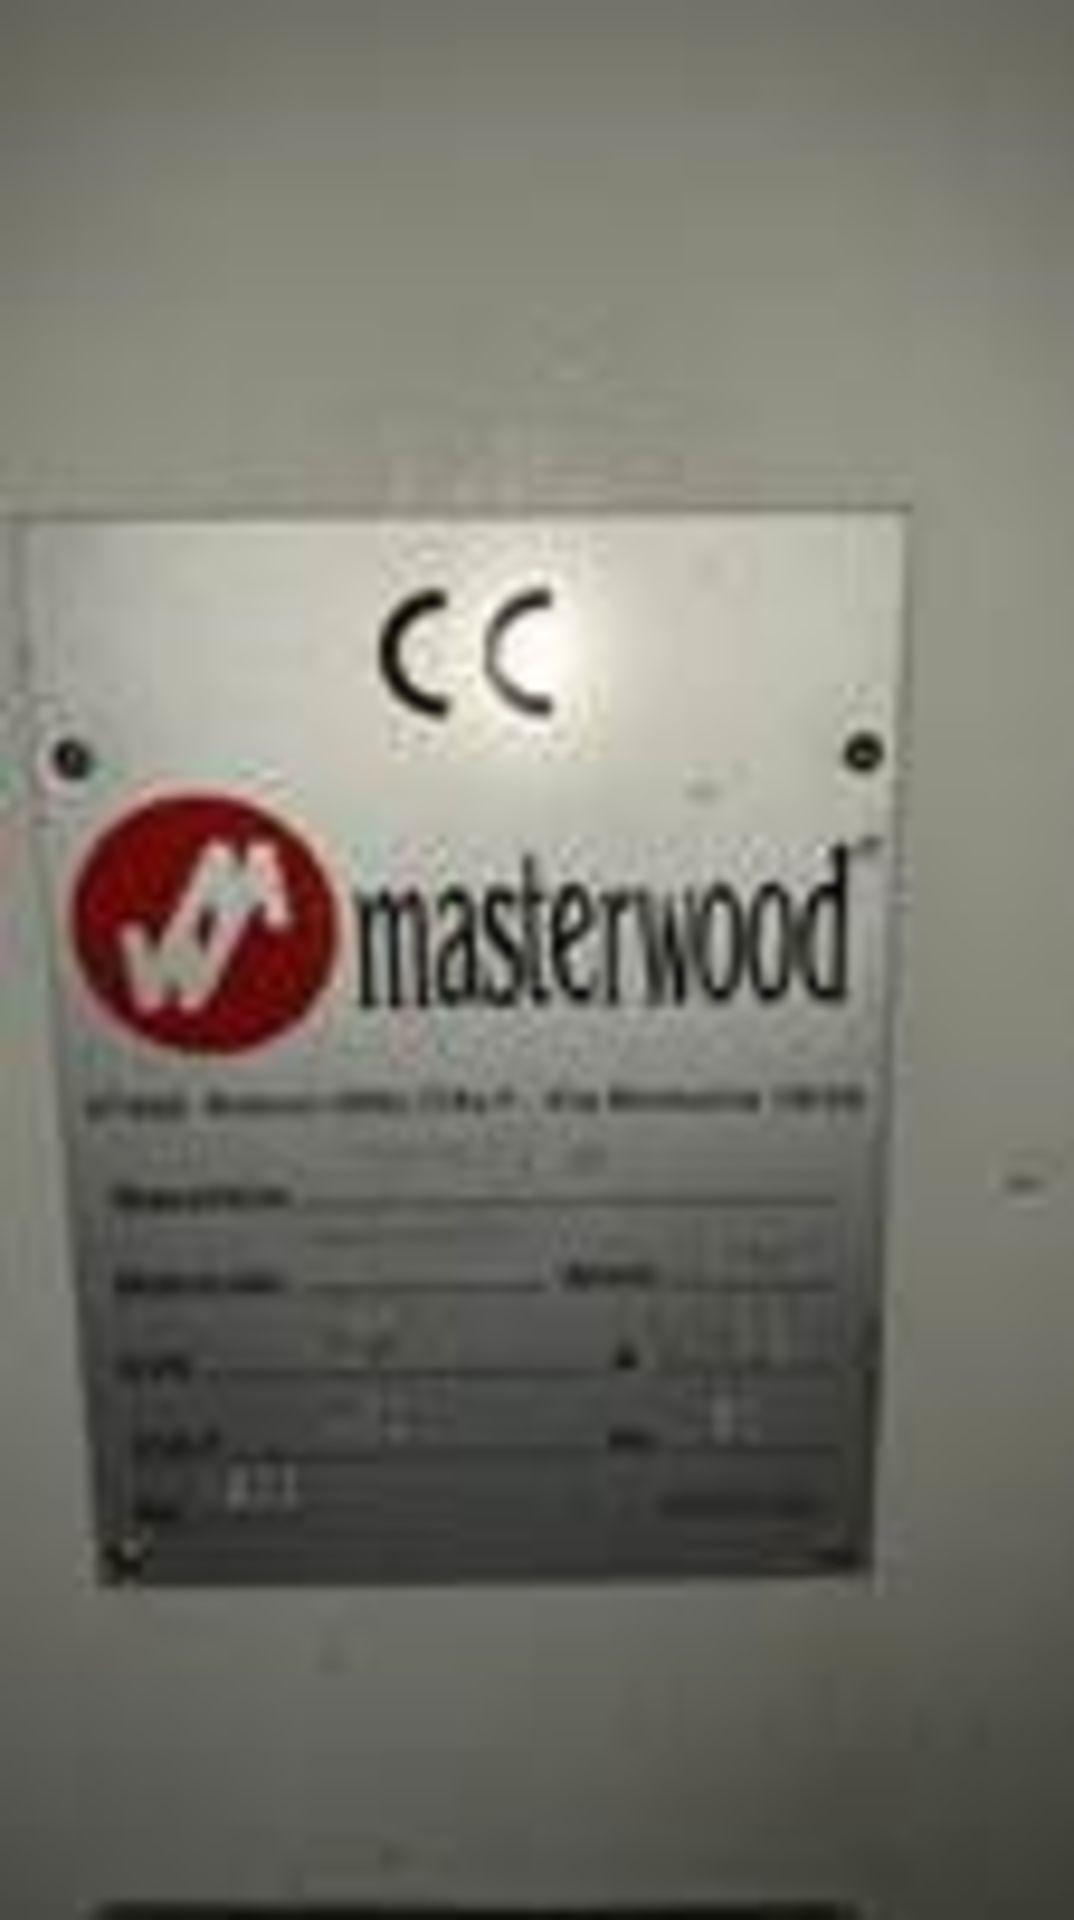 2010 Masterwood Project TF100 CNC Machine Centre - Image 6 of 7